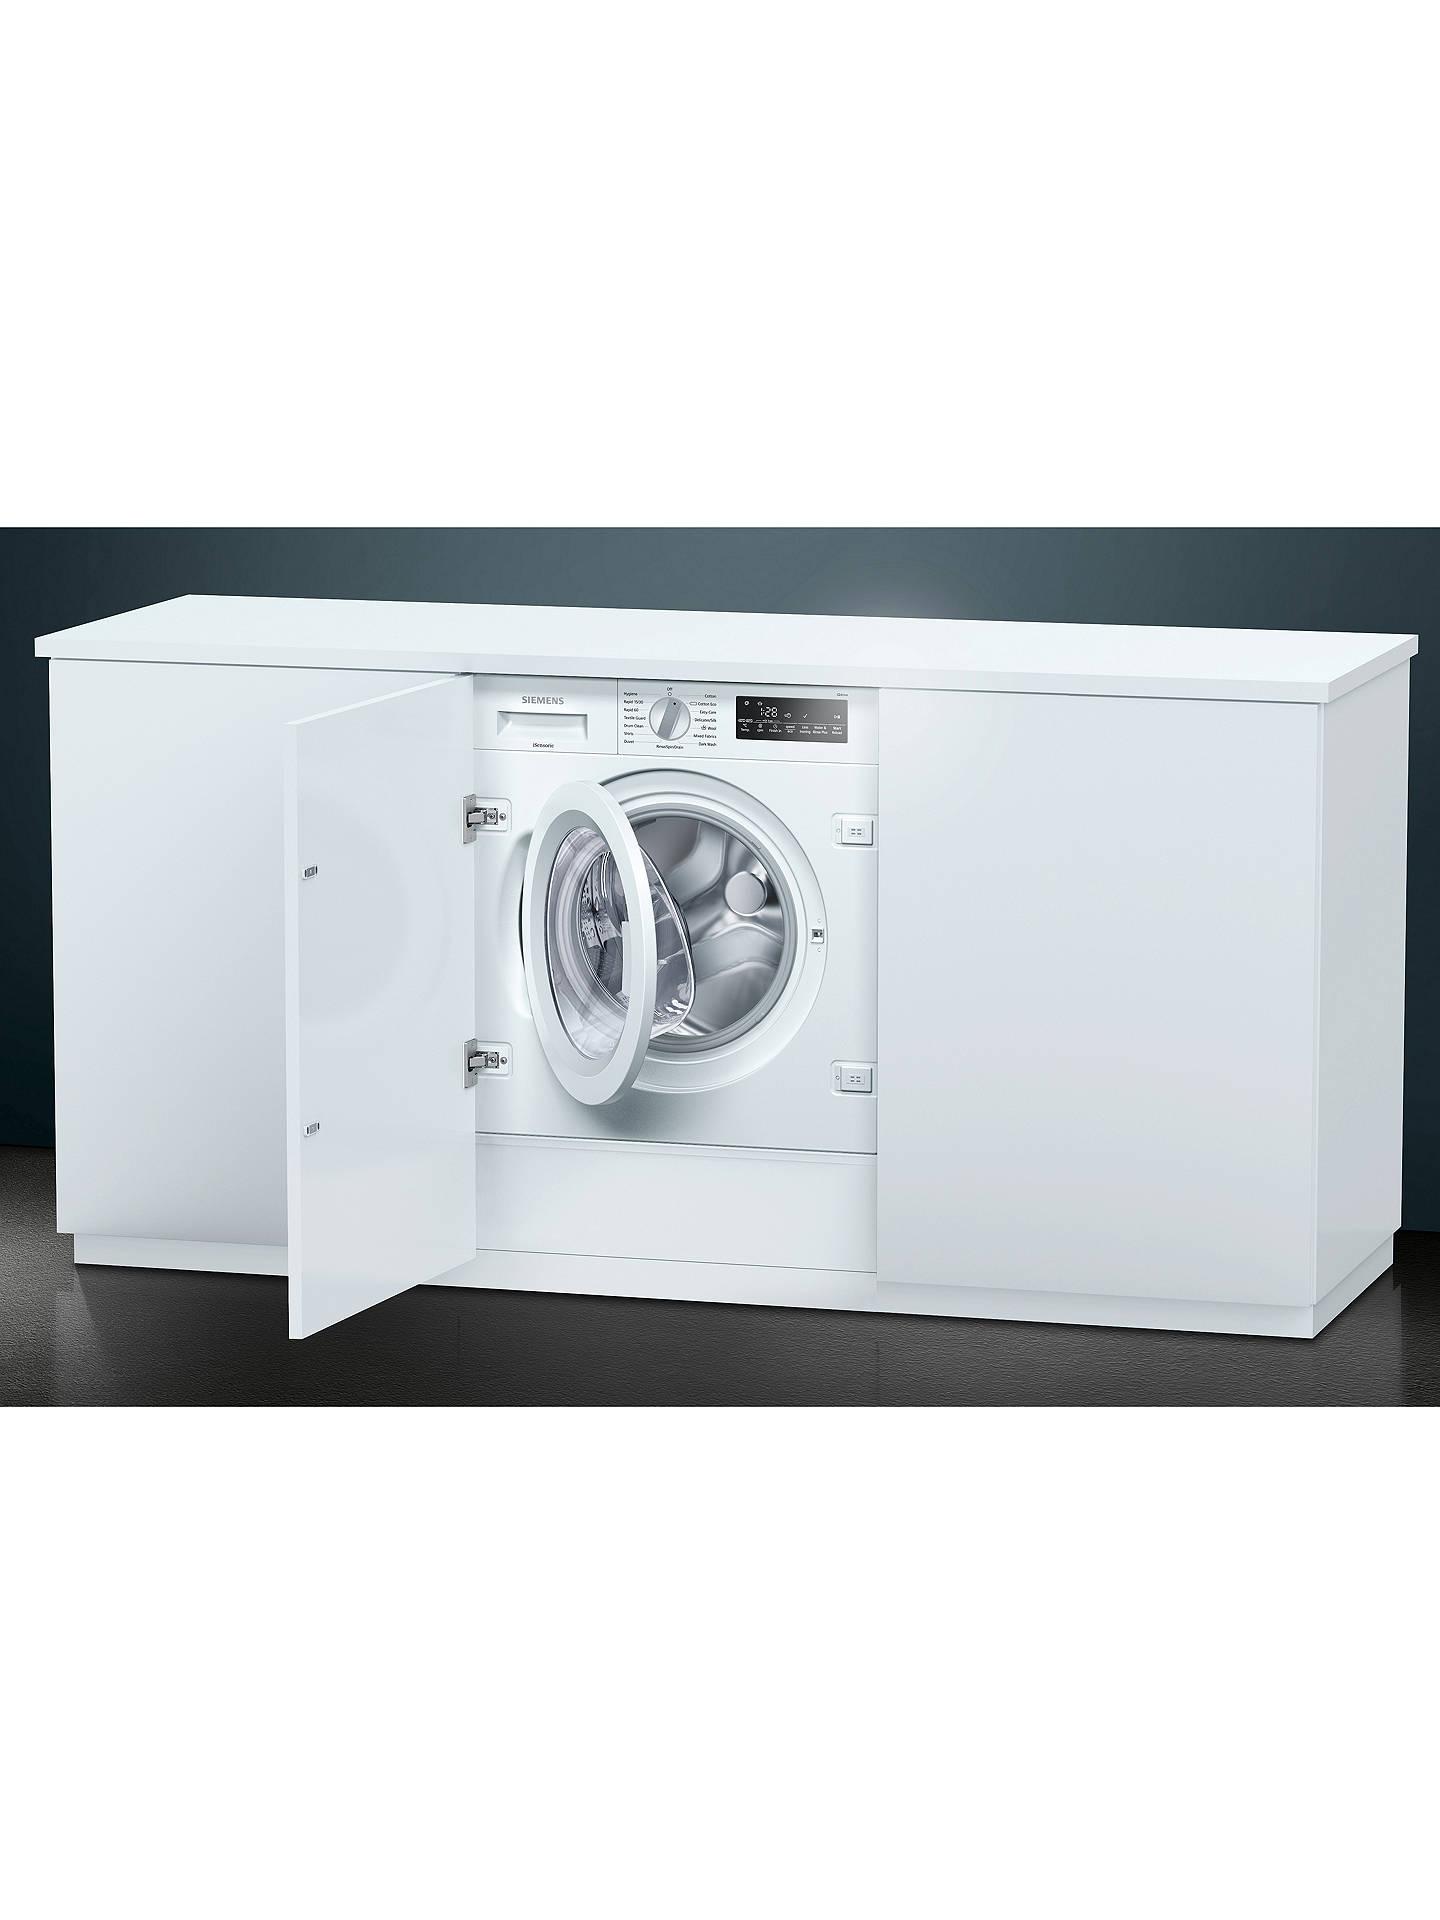 Siemens Washing Machine Built In Integrated Decor Cupboard Door Installation Ki